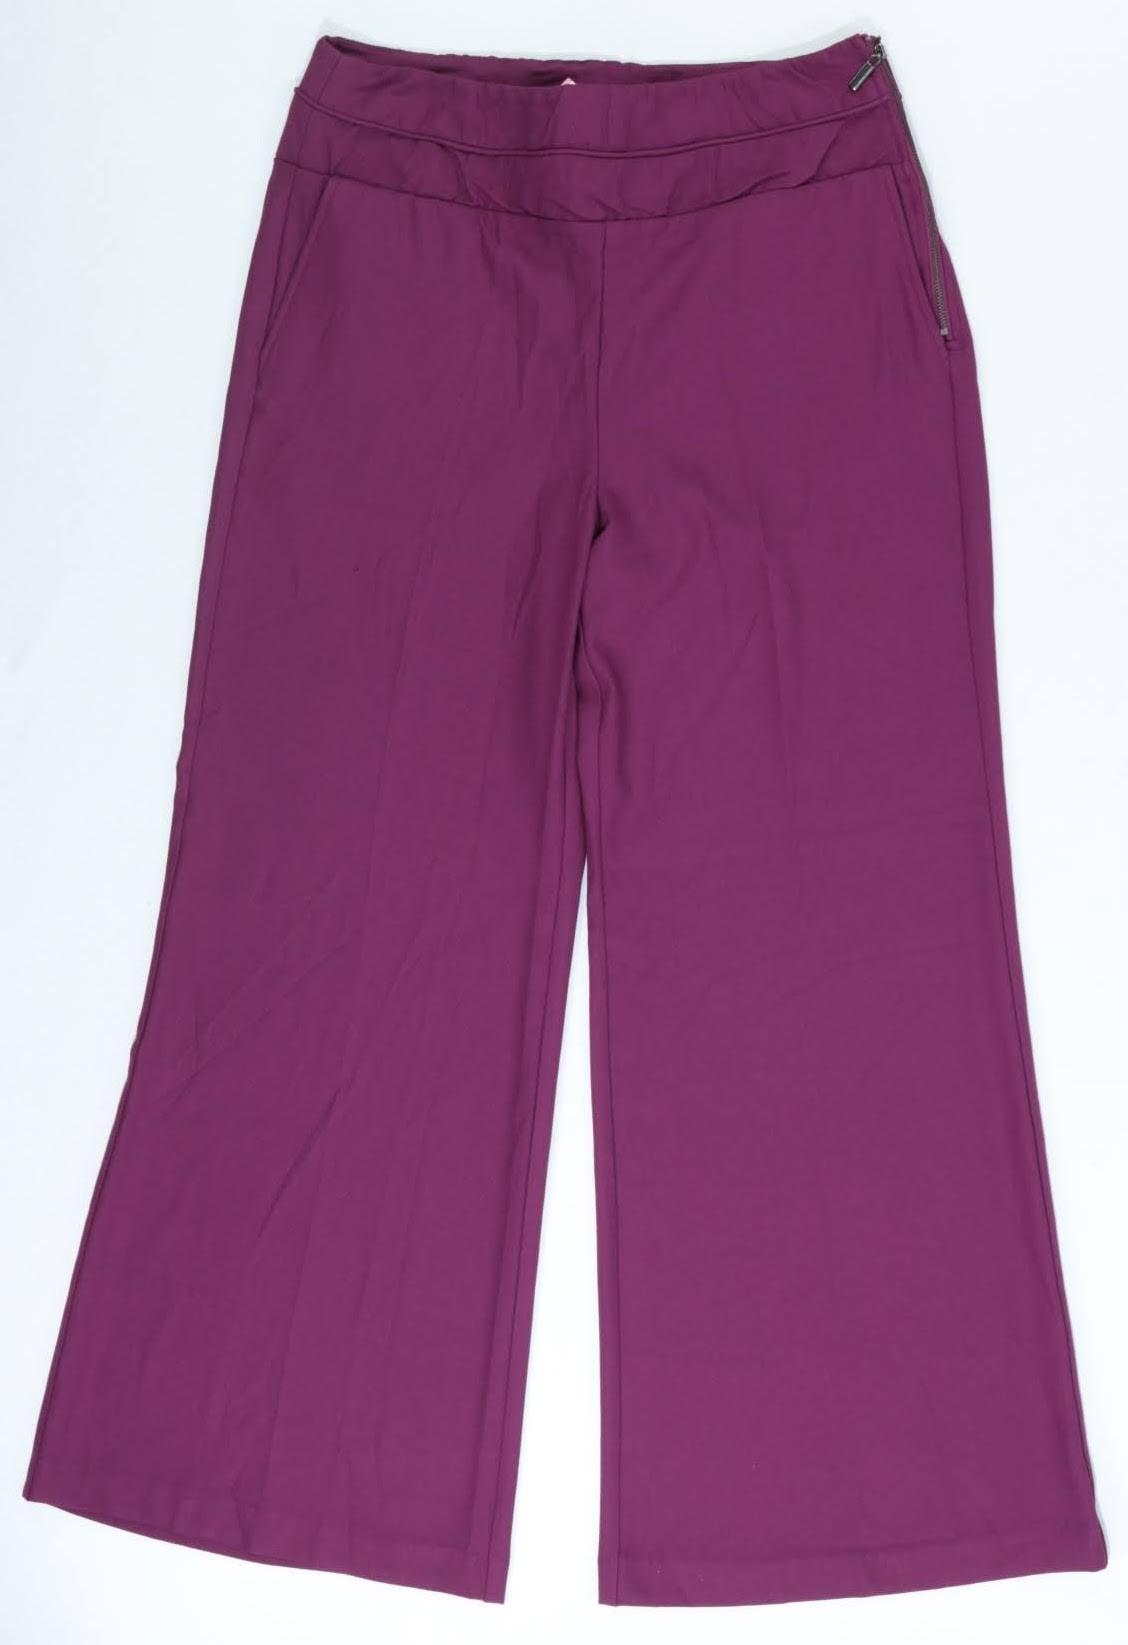 Calça Pantalona - Cortelle - 44